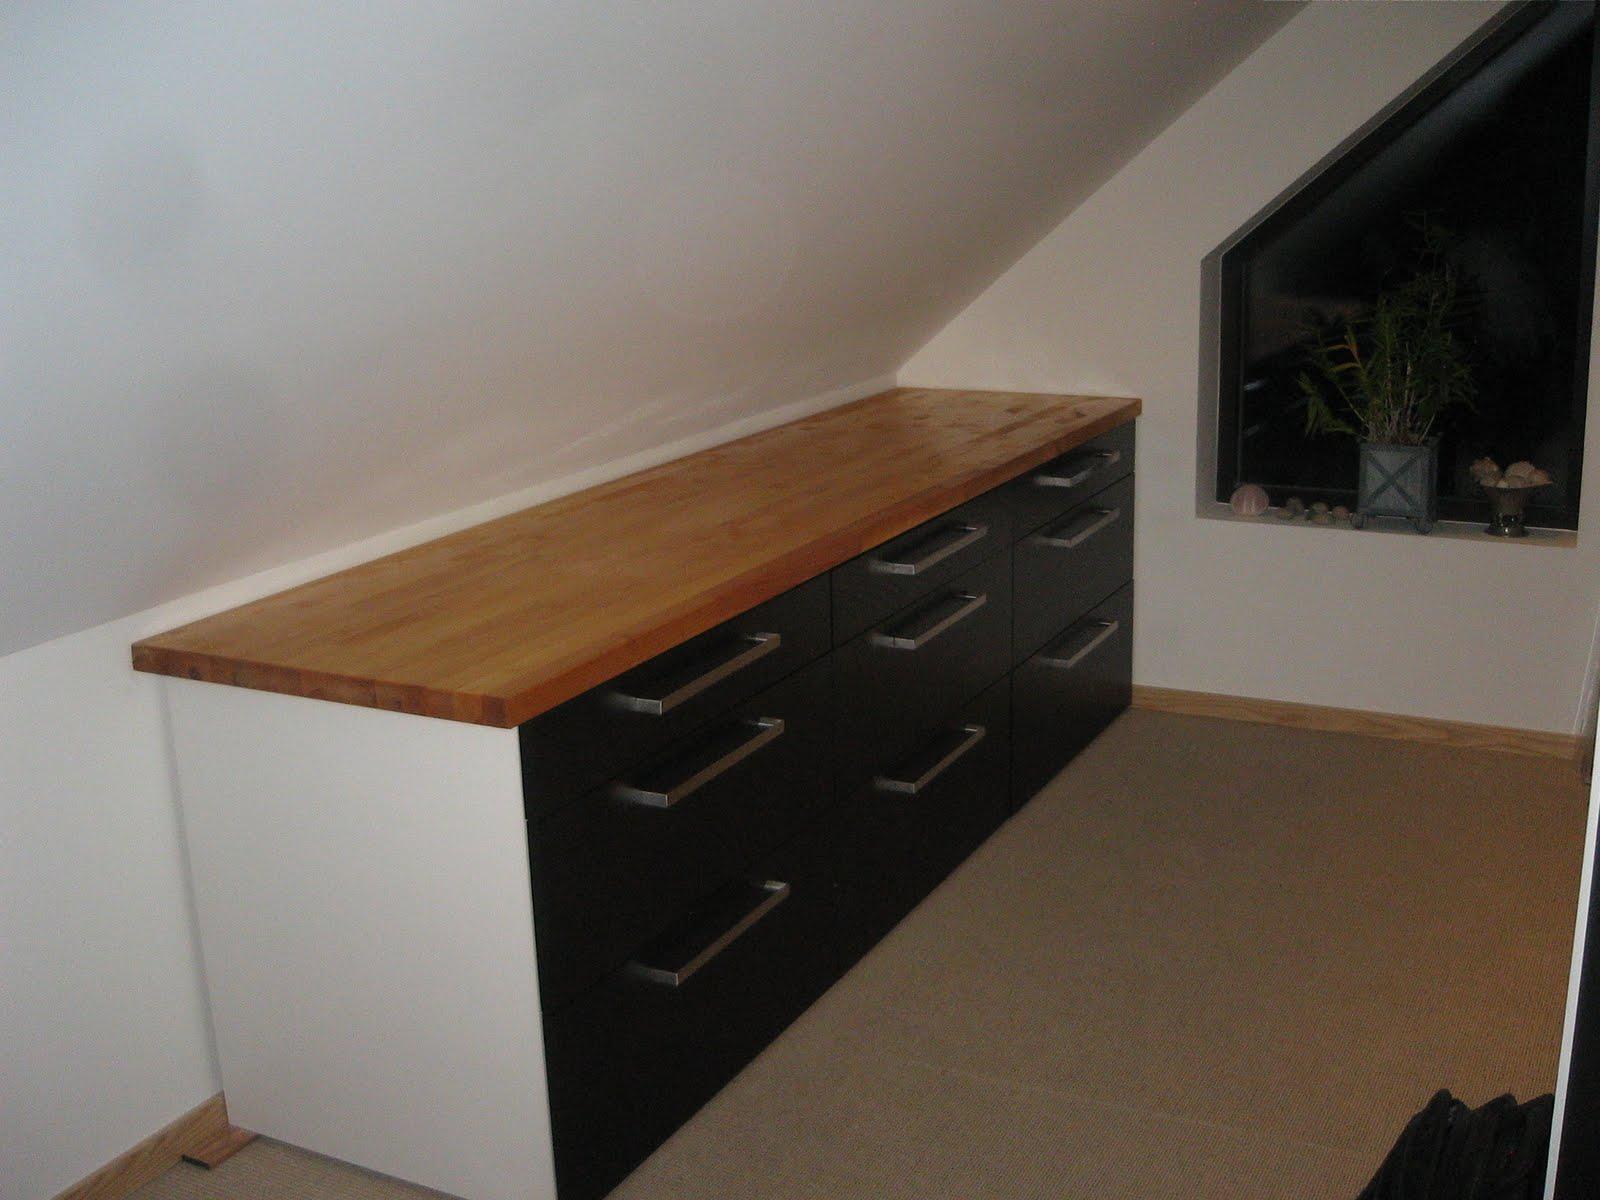 kitchen cabinets in bedroom ikea hackers. Black Bedroom Furniture Sets. Home Design Ideas